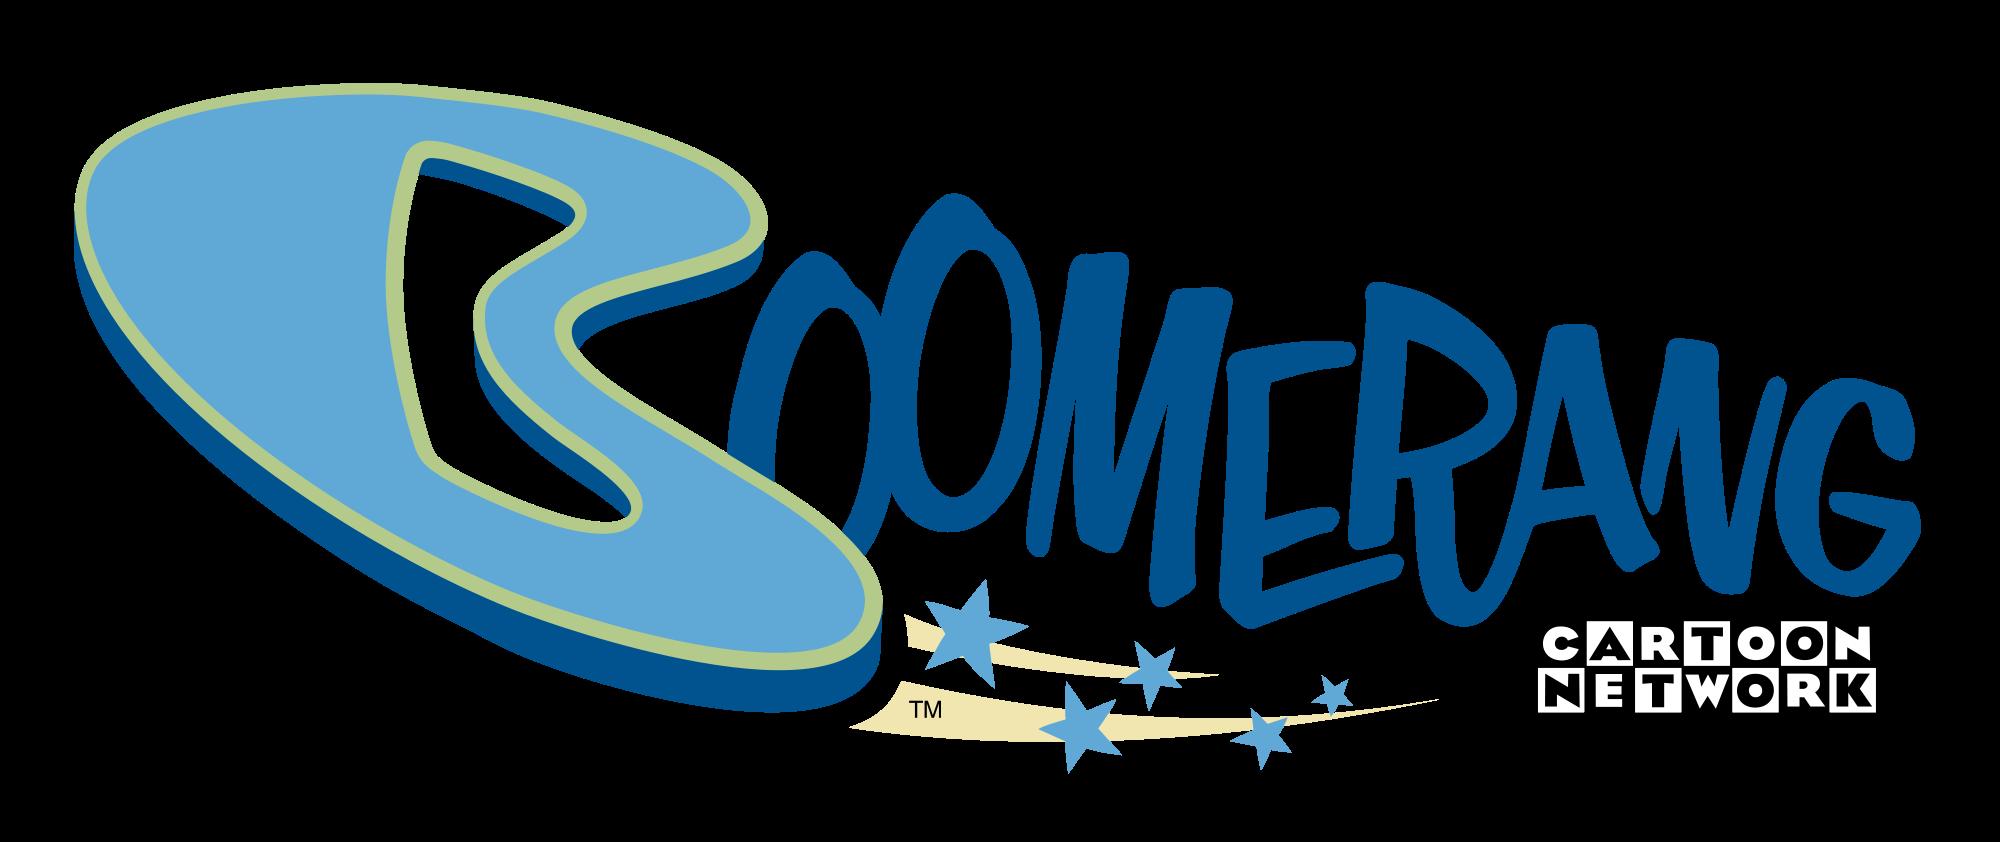 Cartoon Network Cartoon Network Boomerang Cartoon Network Old School Cartoons